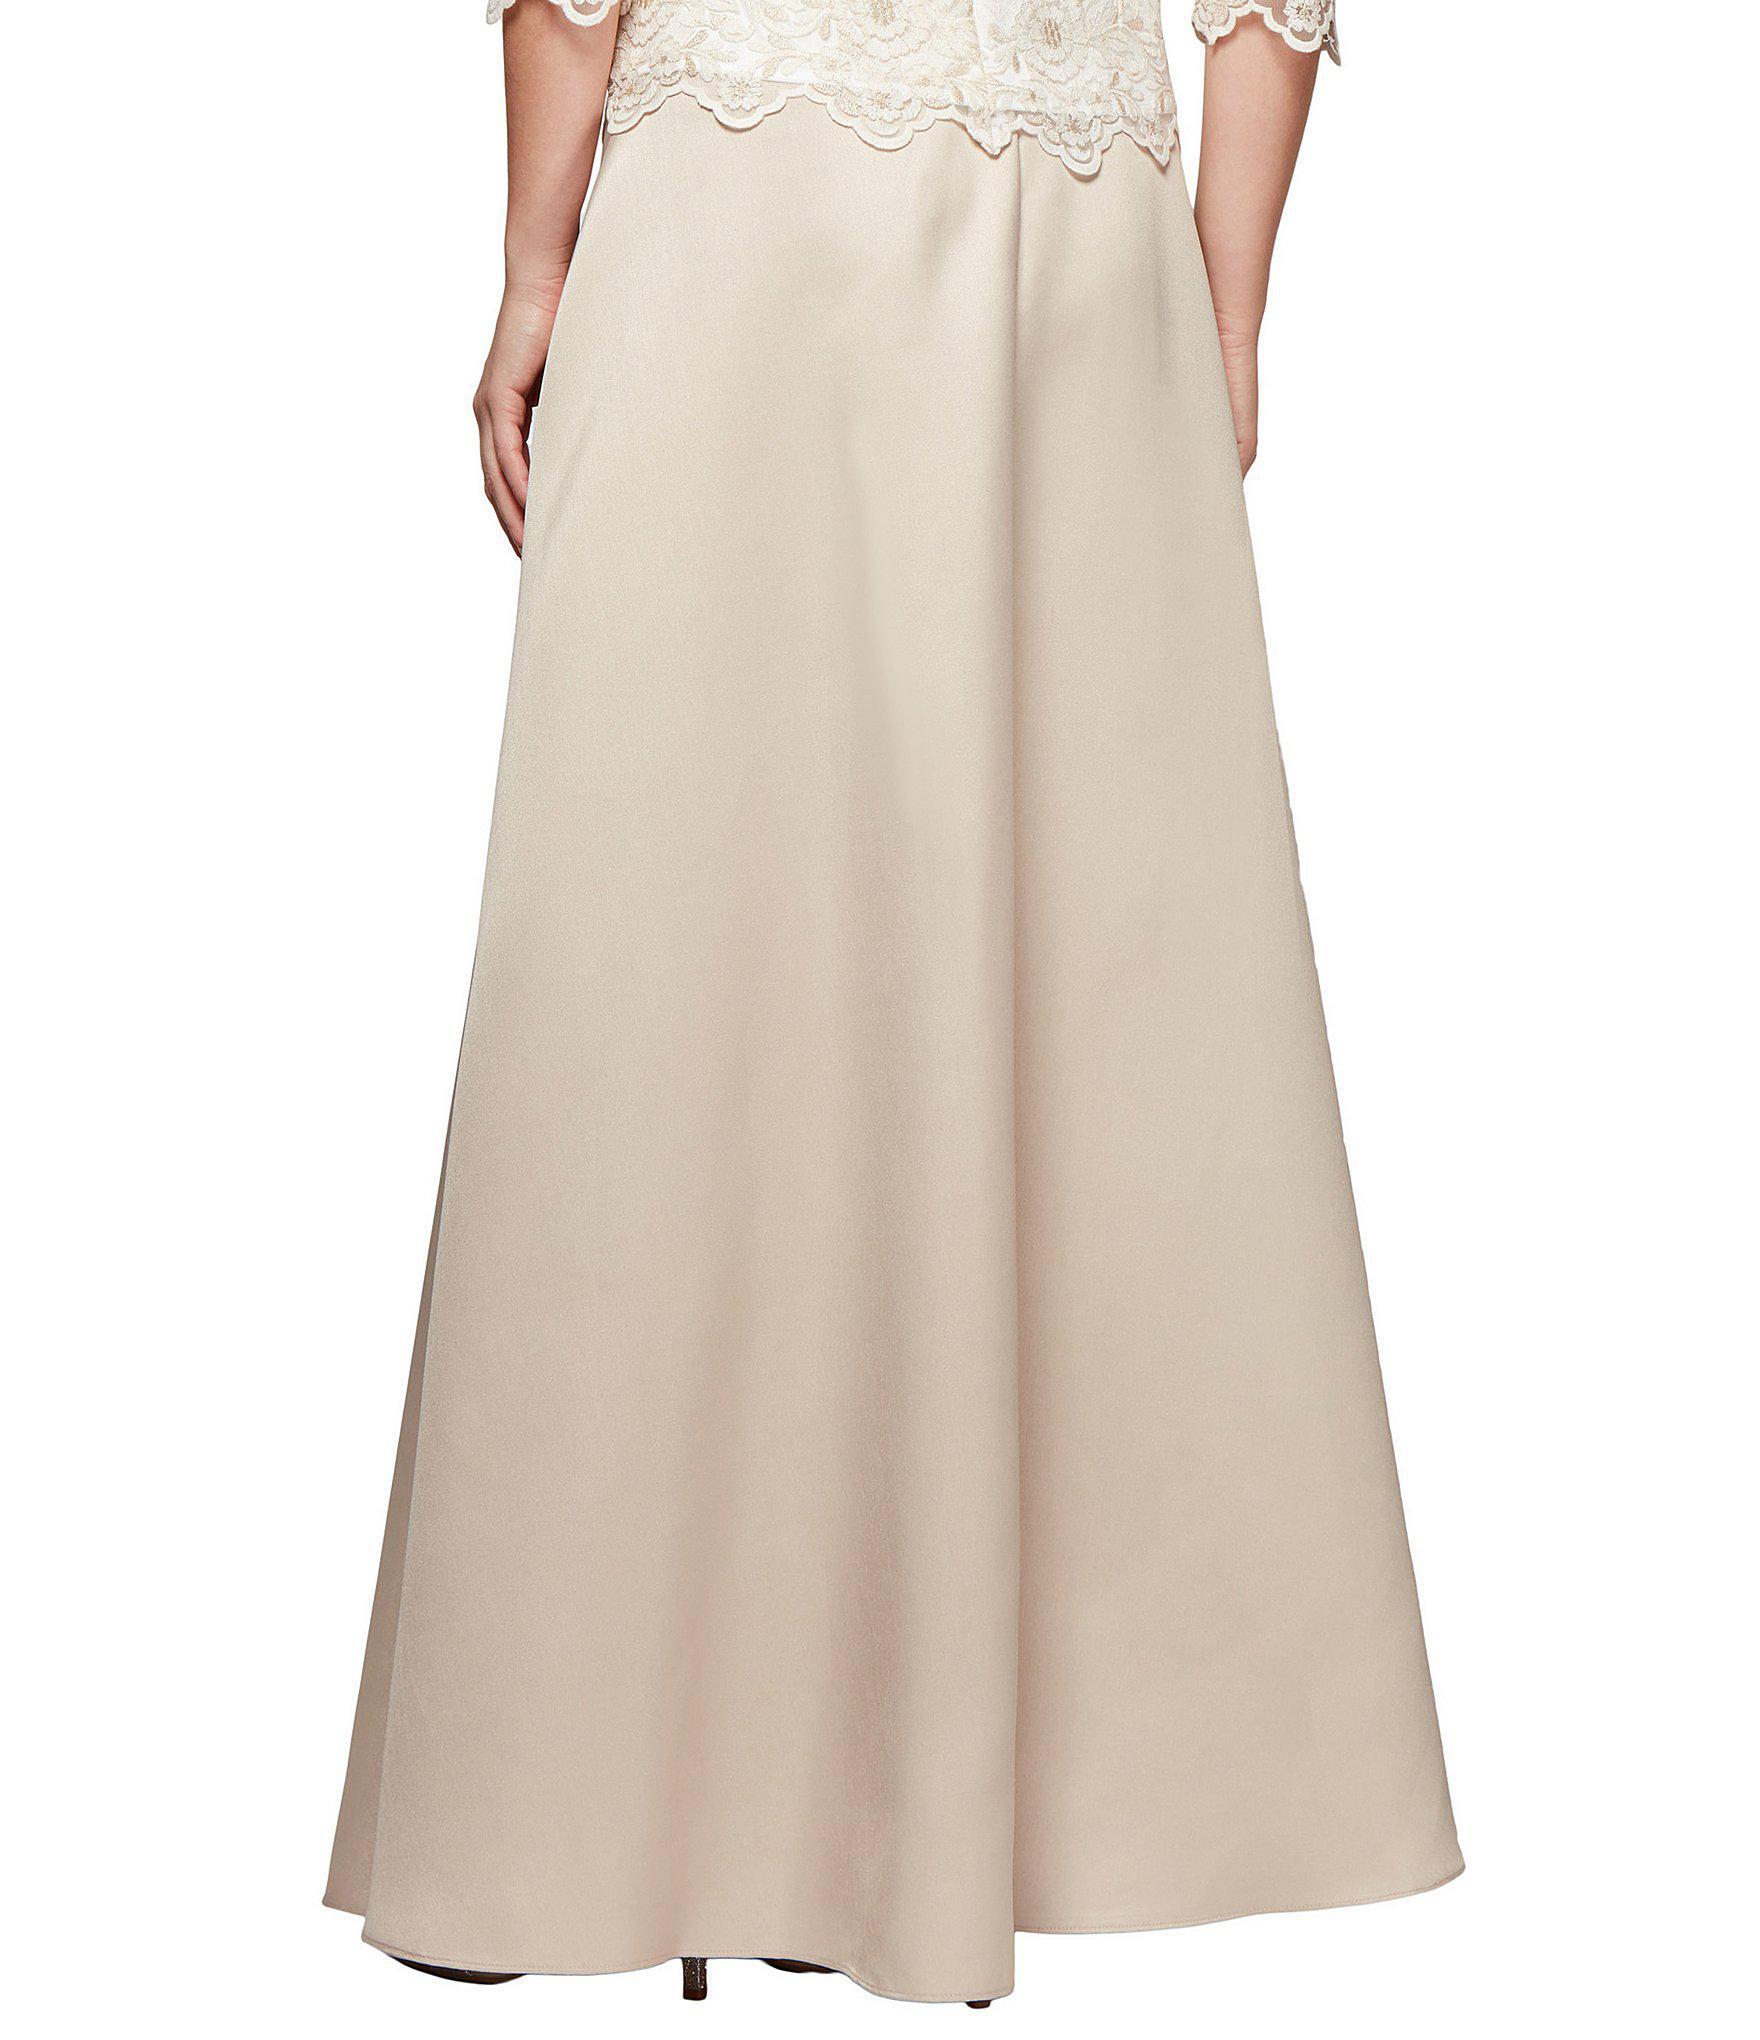 e66b29ee84 Dillards Petite Long Skirts